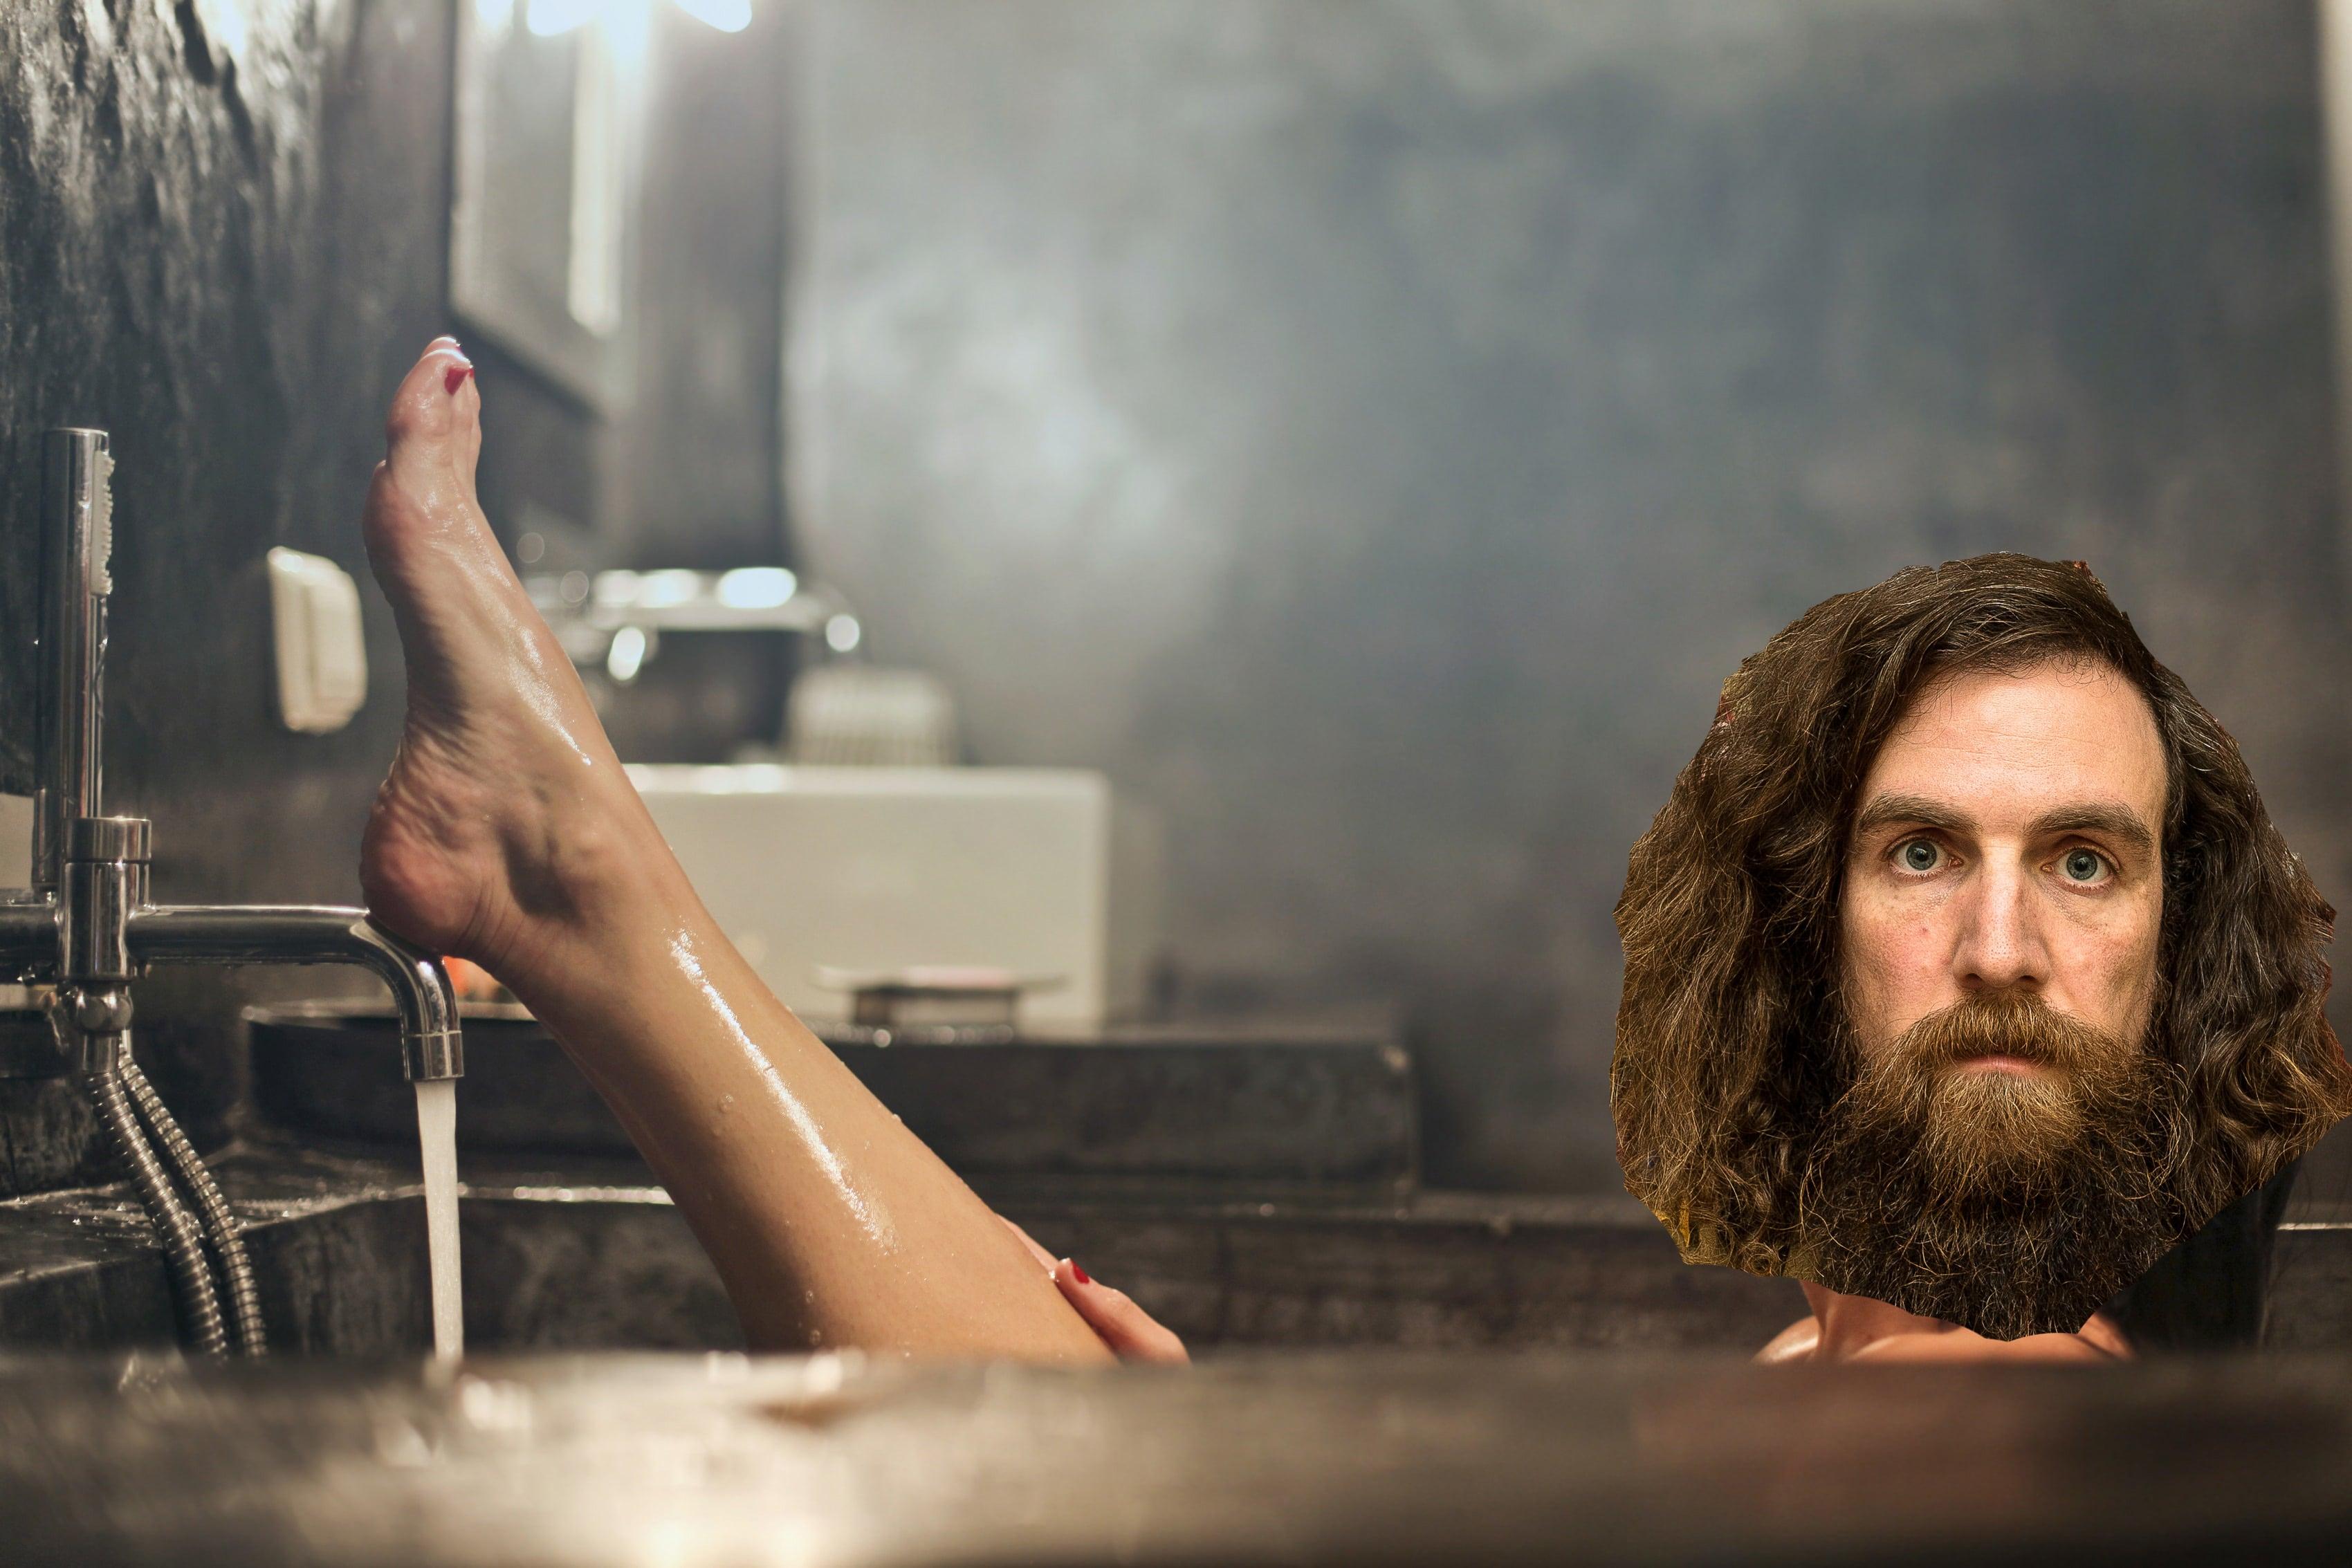 real bath